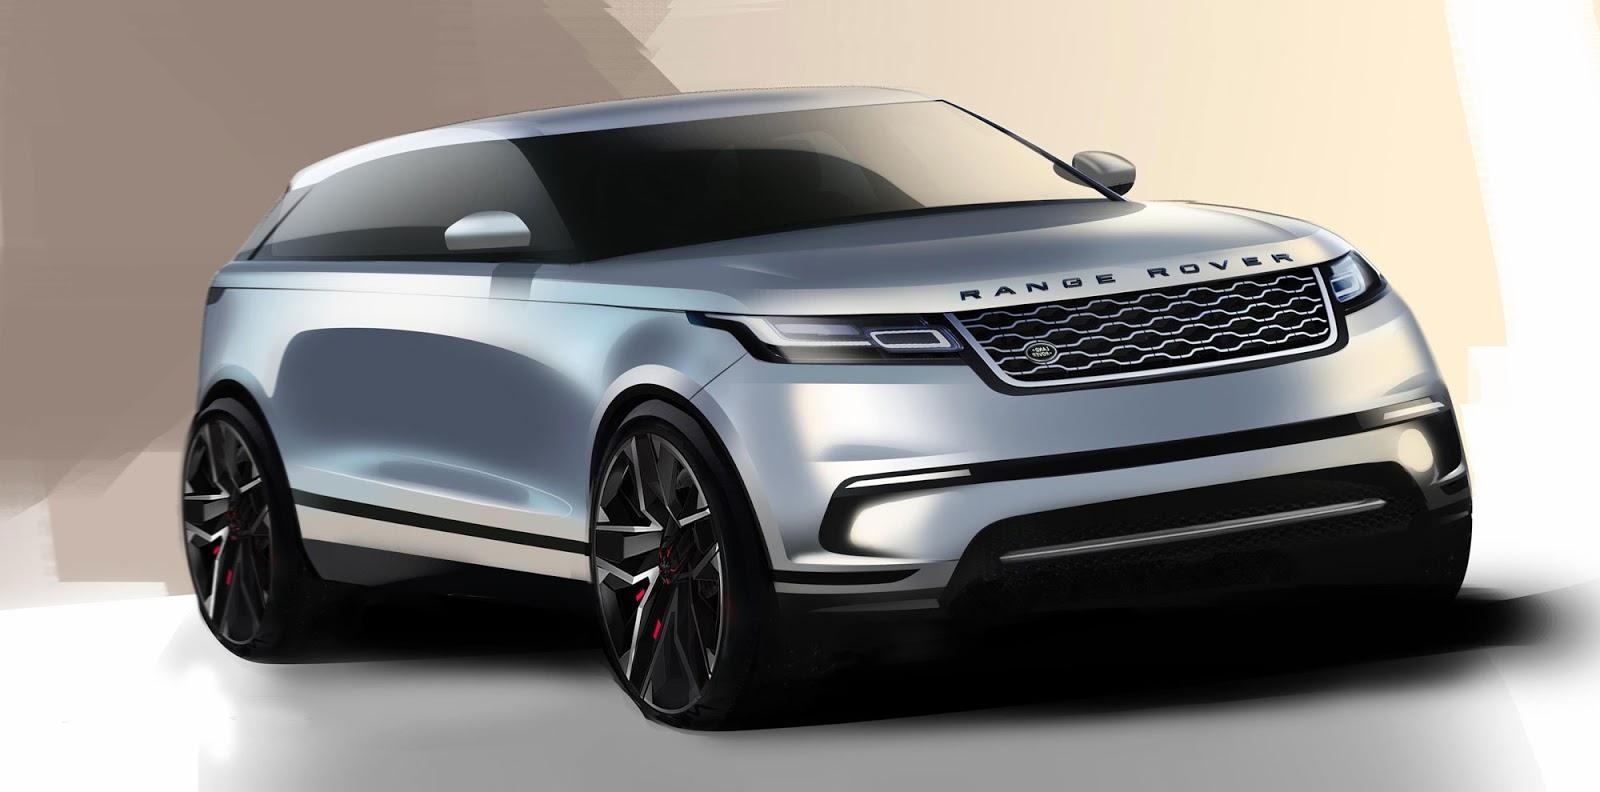 Range Rover Velar sketch front quarter view in blue